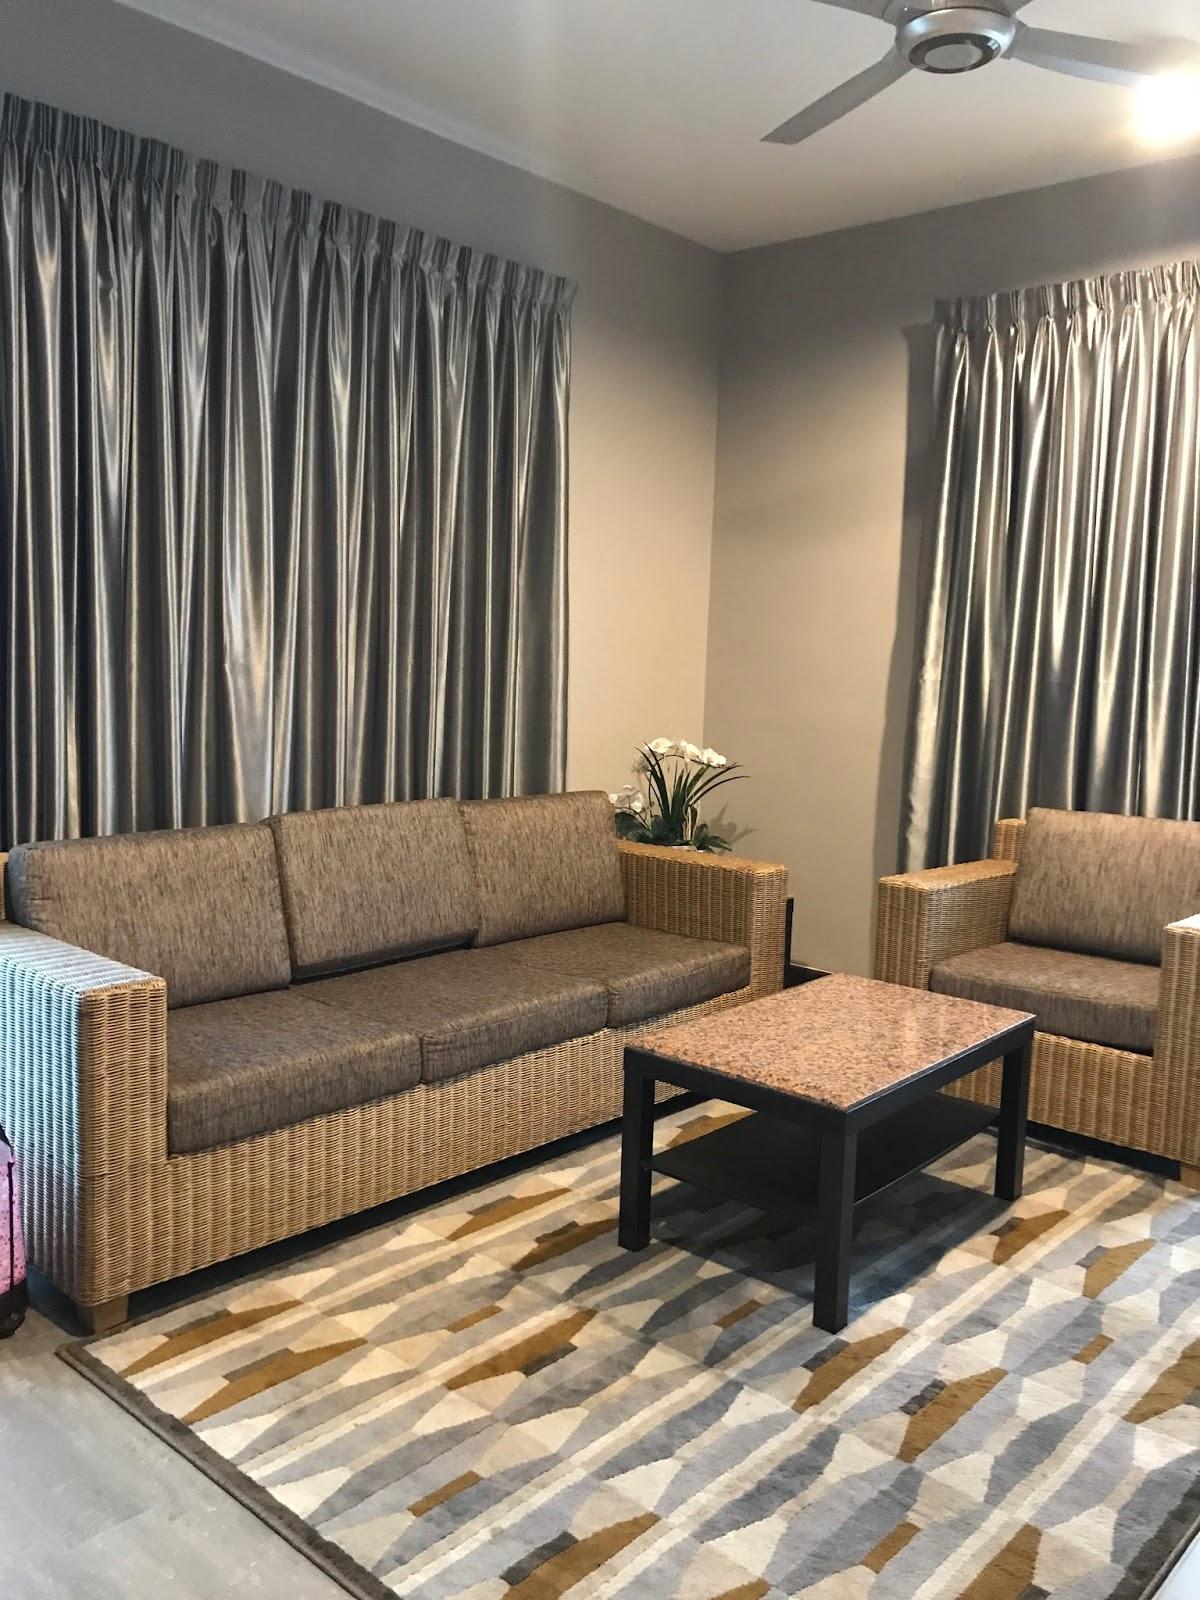 21 Things to Do in Dubai in Lowest Budget - FlashyDubai.com